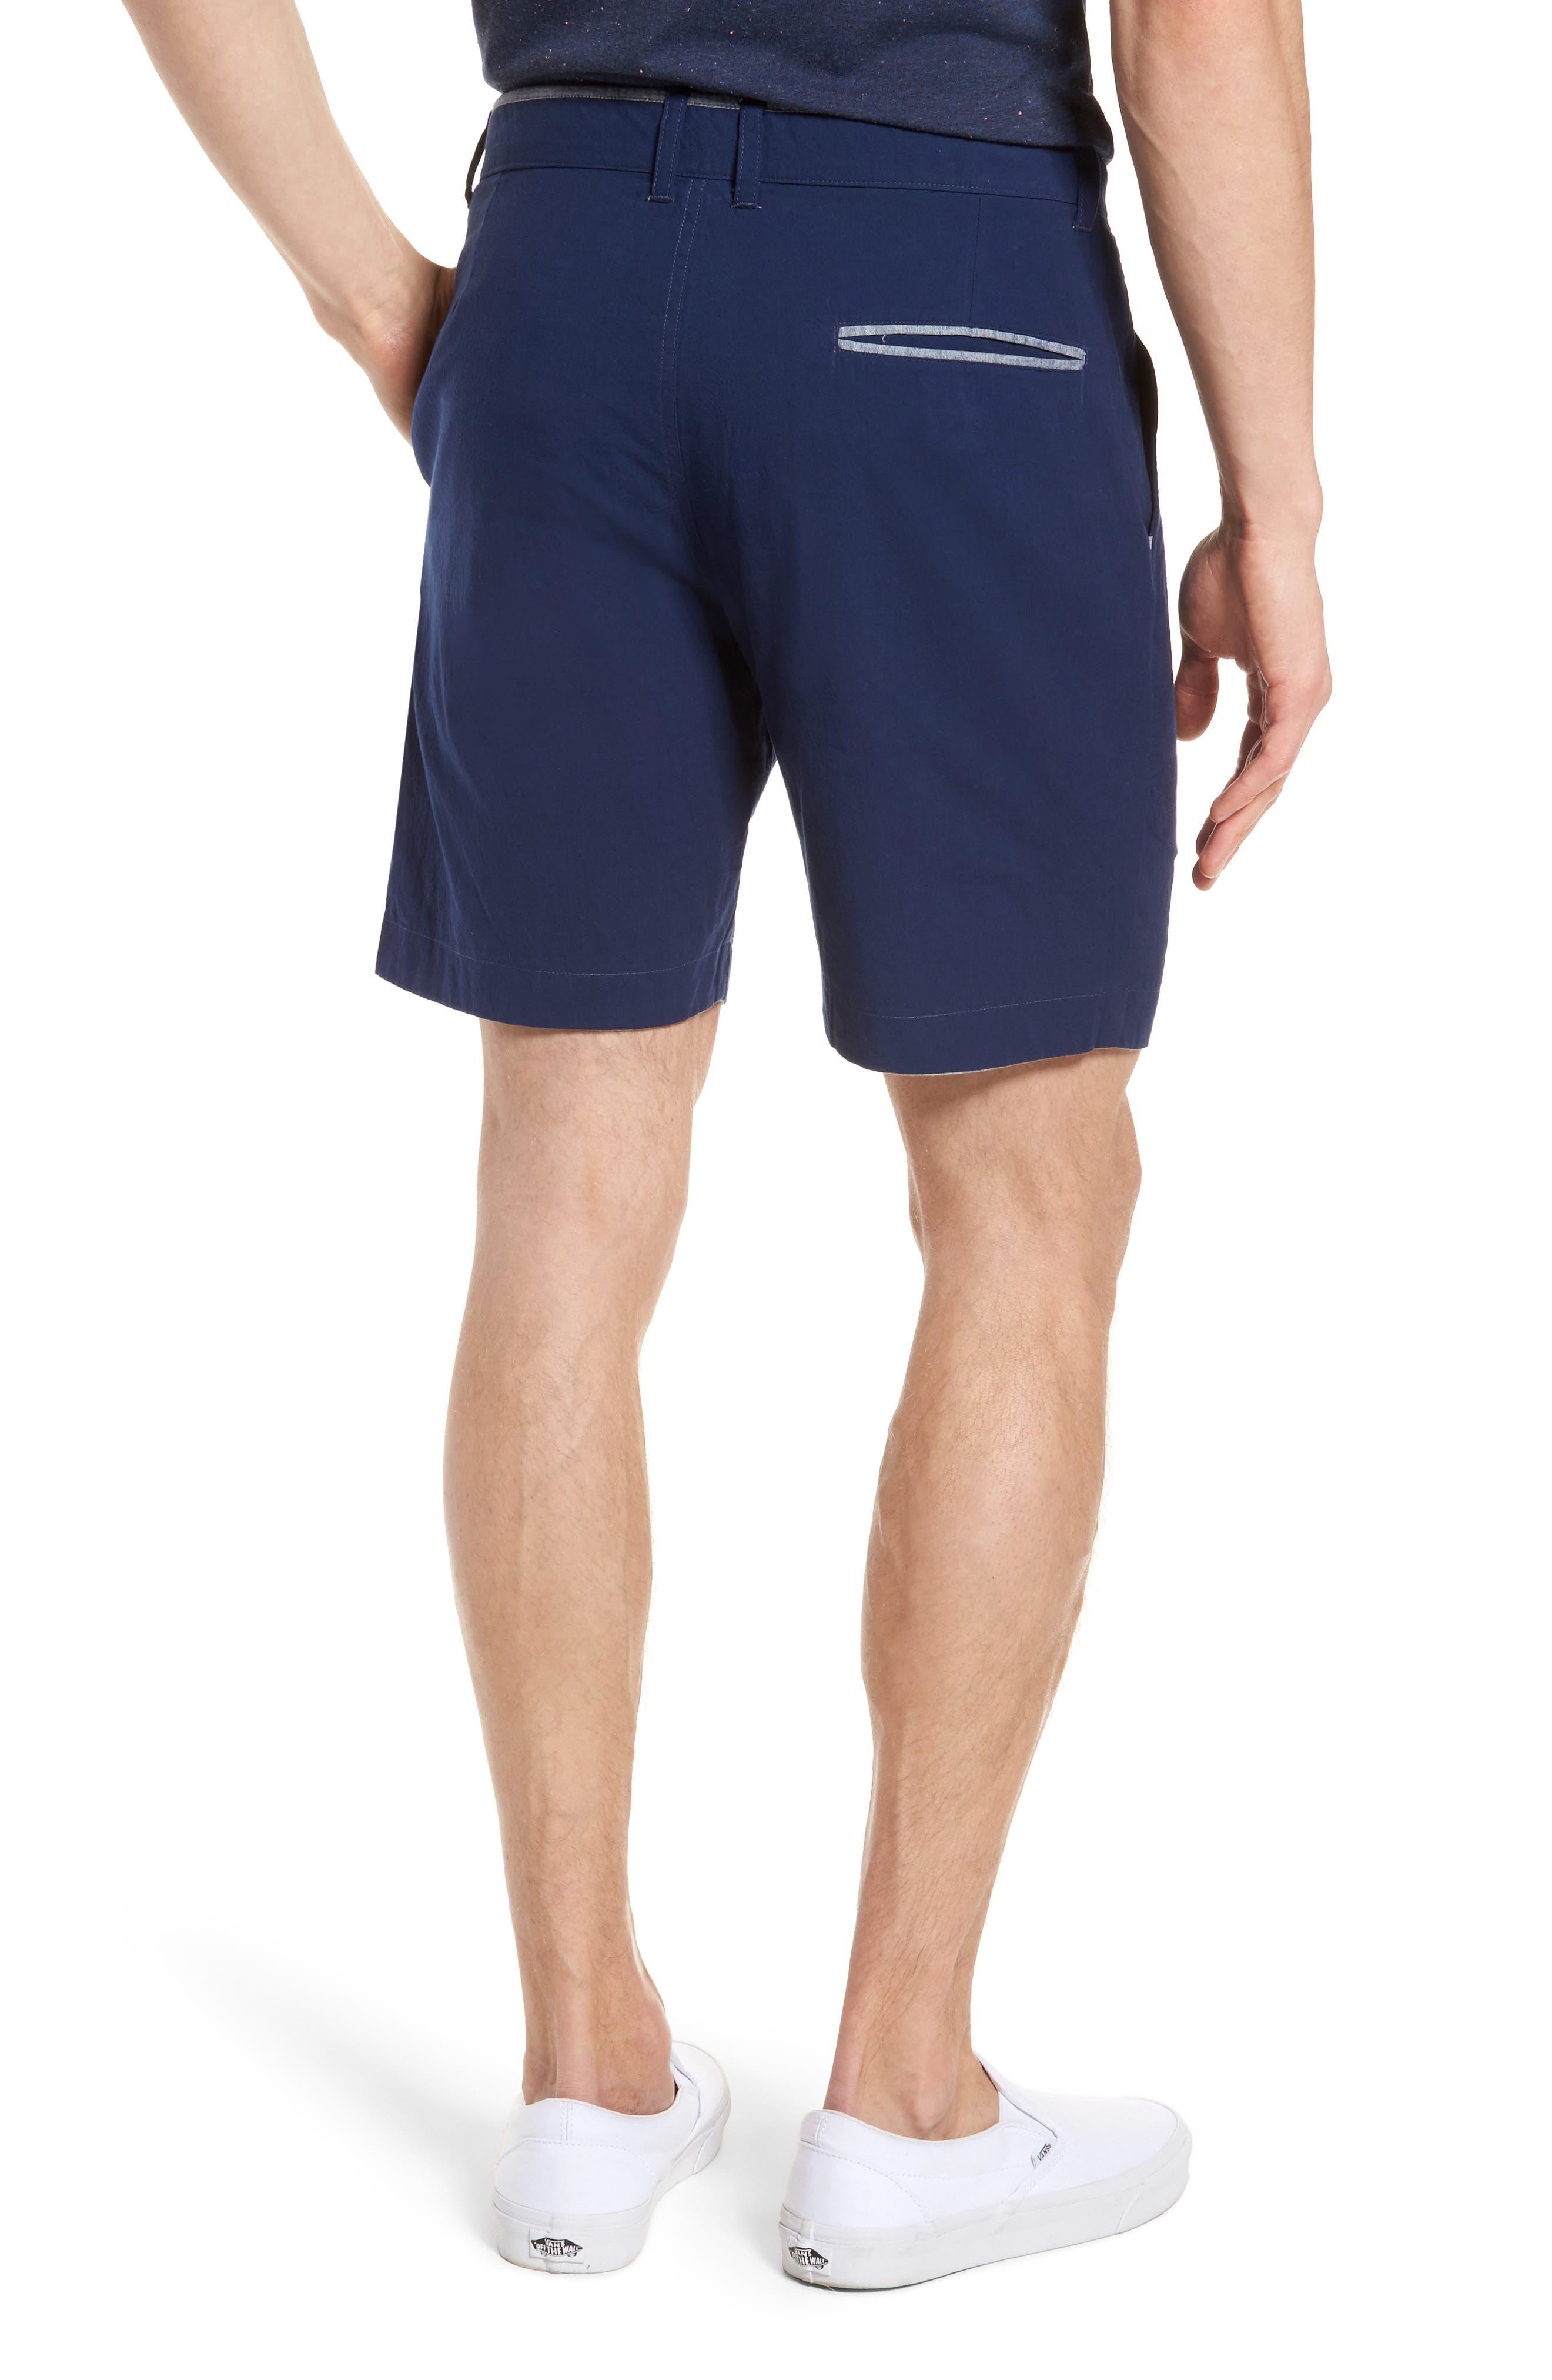 Rock Steady Reversible Shorts,                             Alternate thumbnail 3, color,